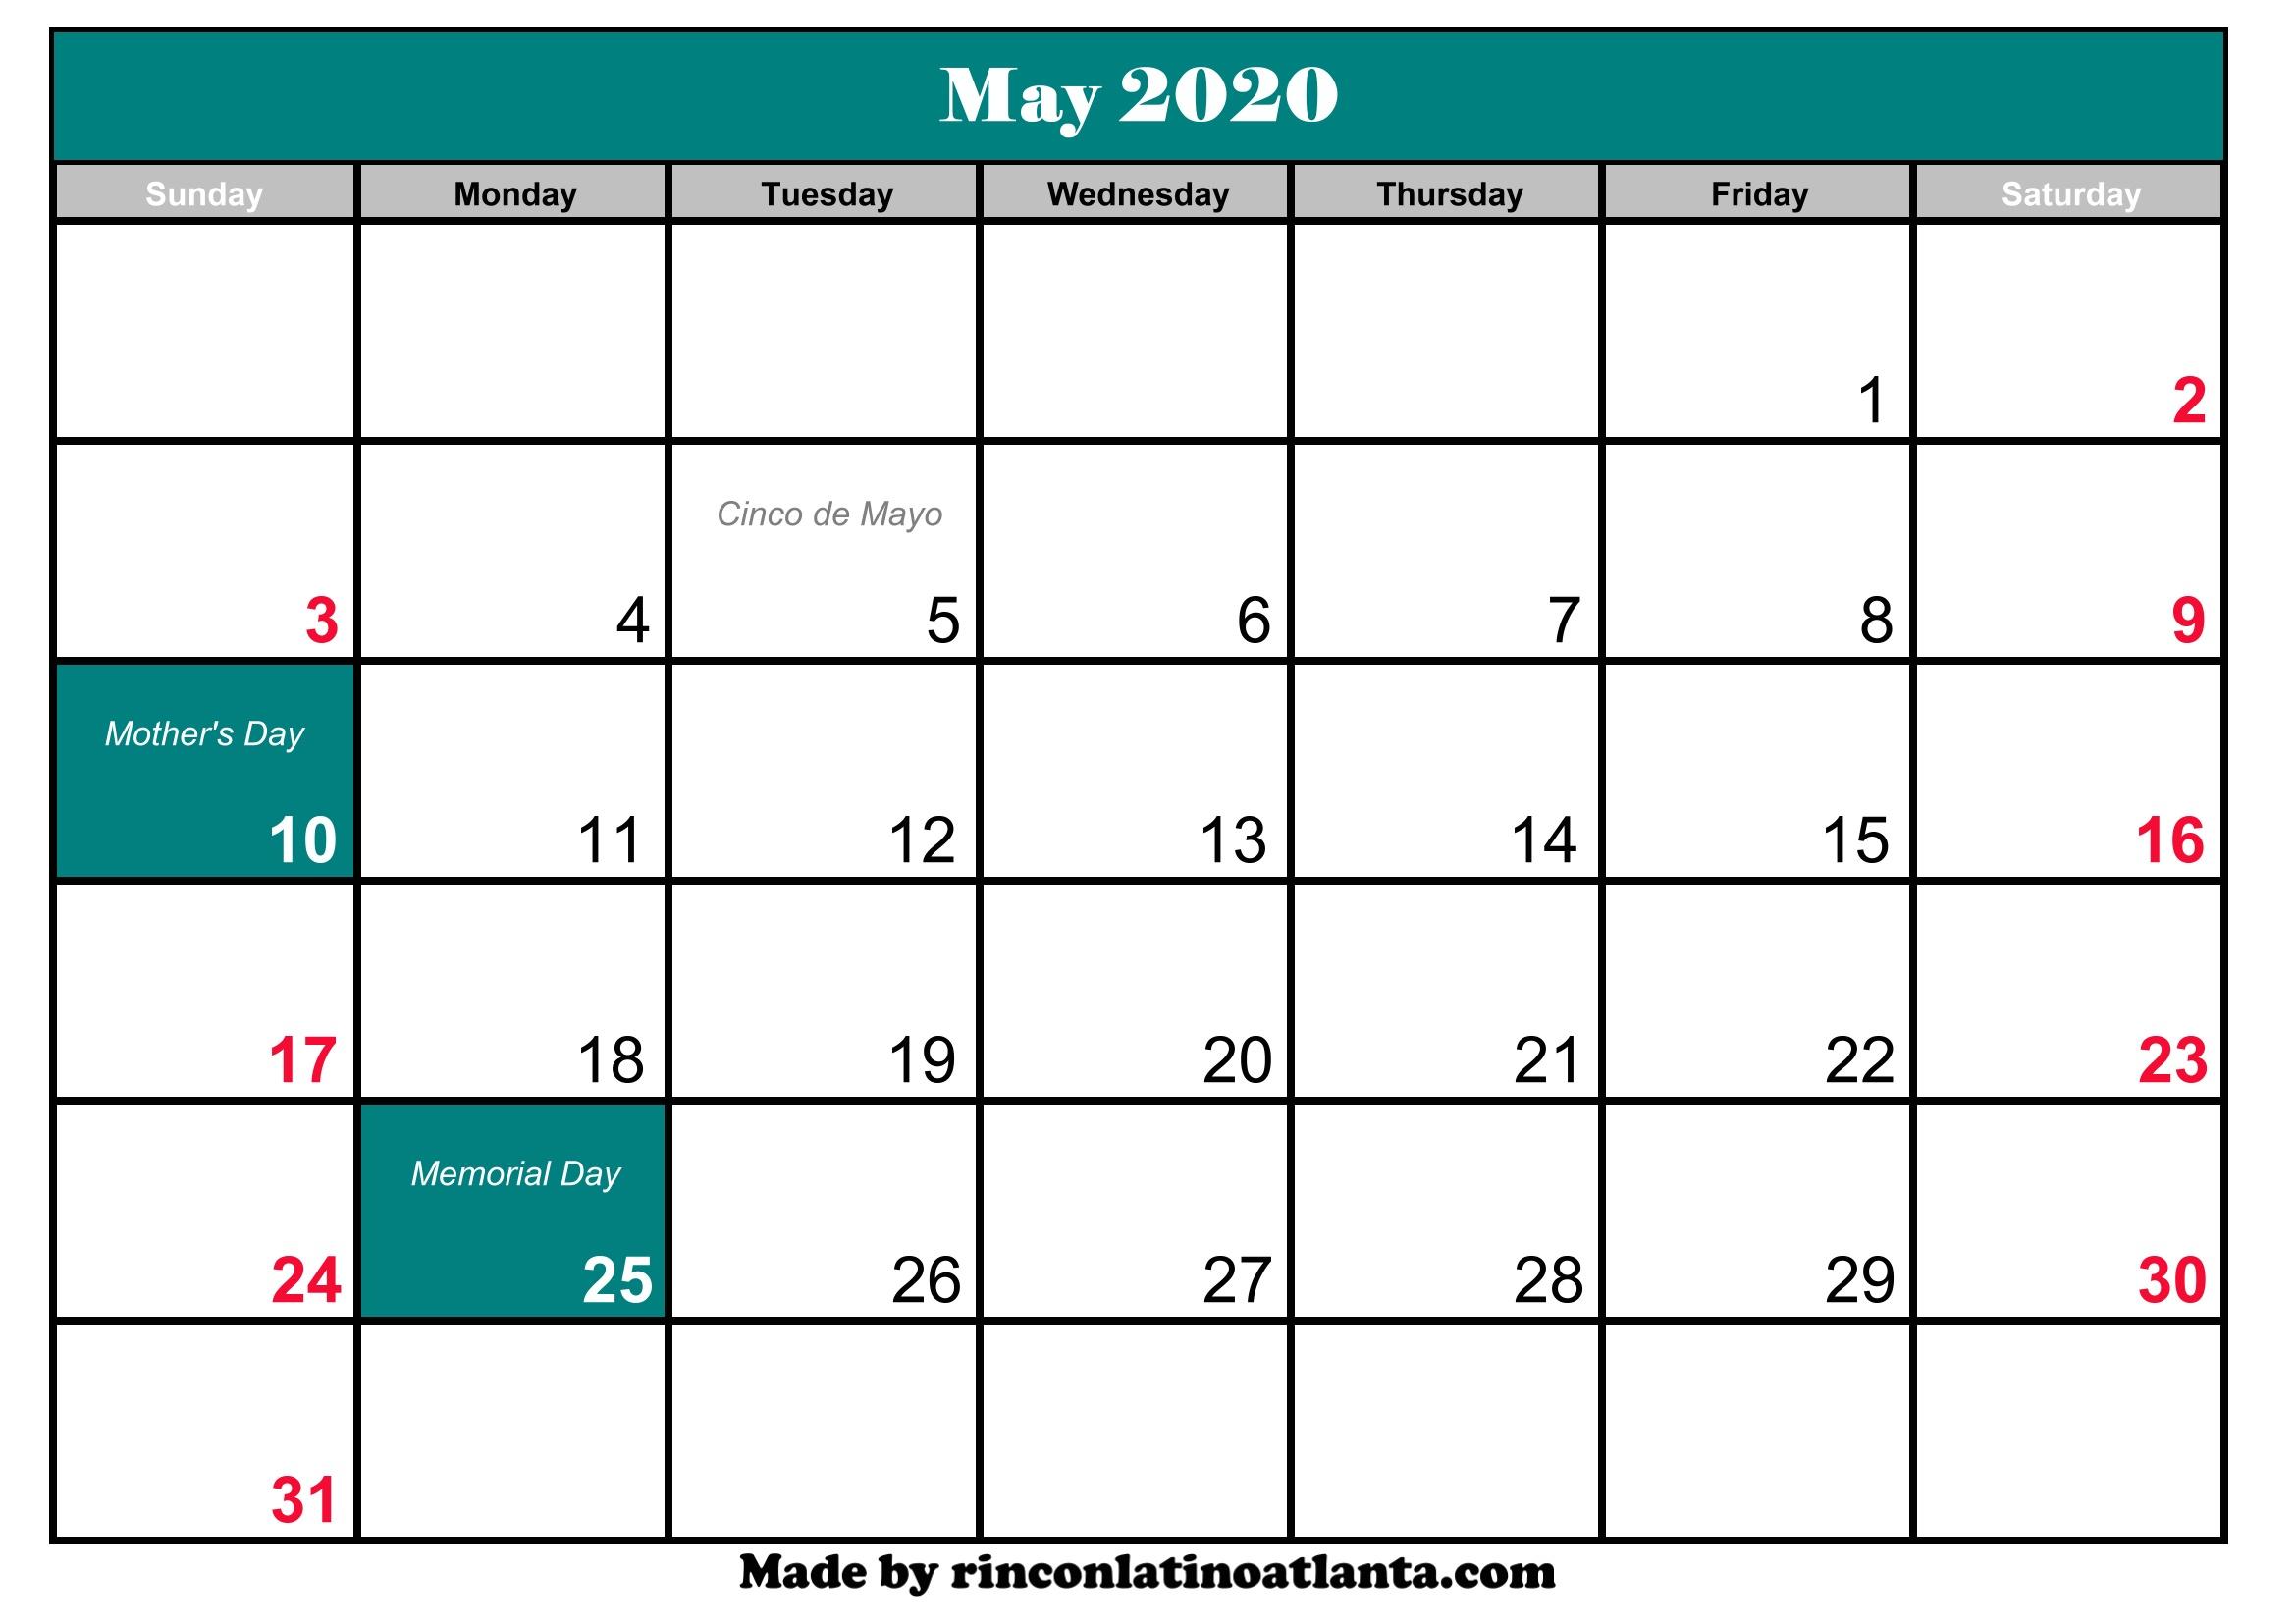 May 2020 Calendar With Holiday | Calendar Template Printable